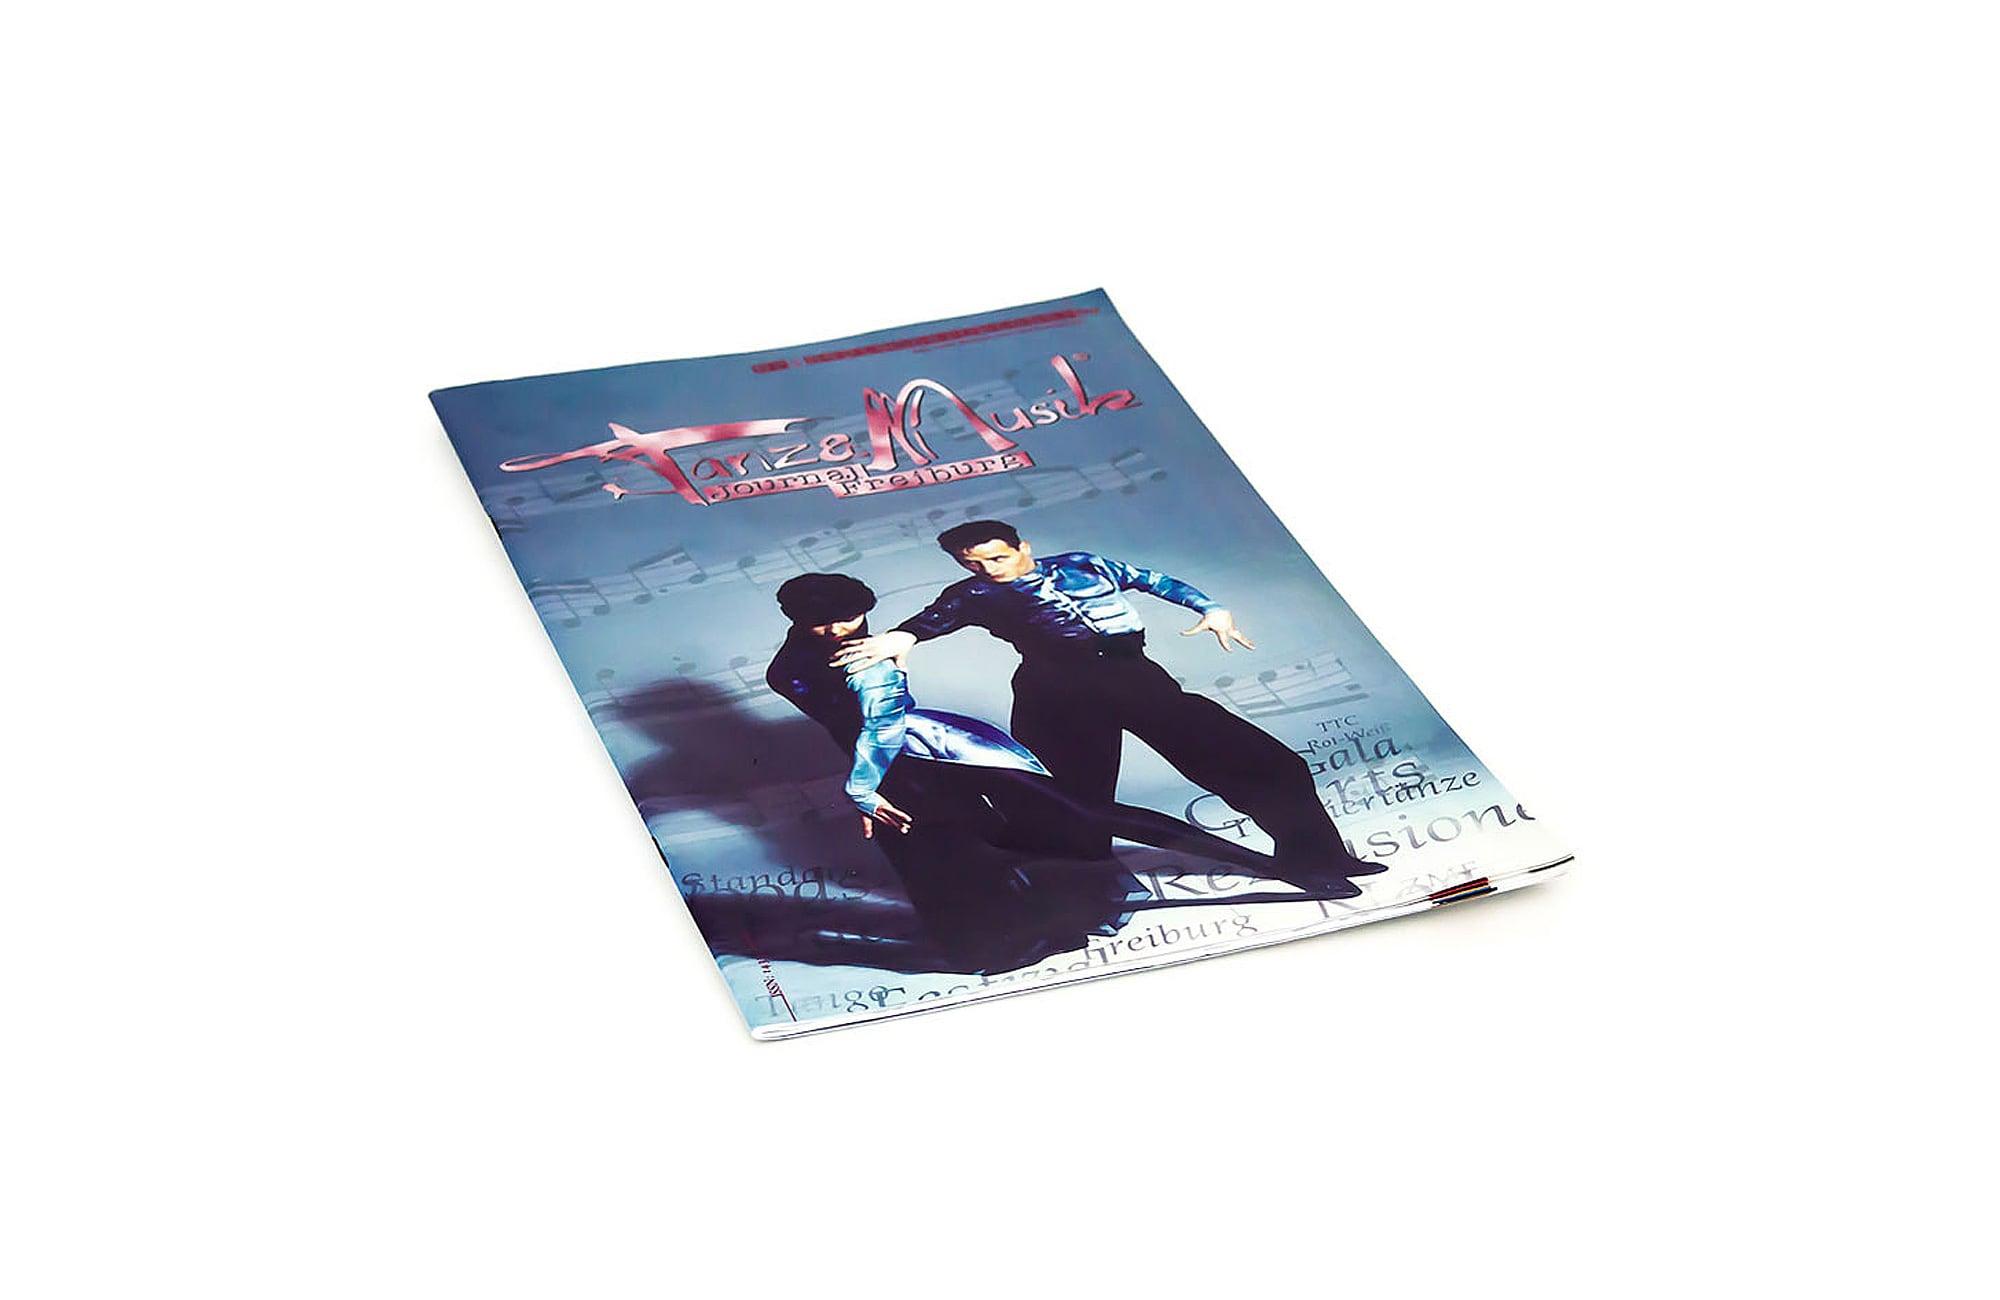 Fachmagazin Cover Design